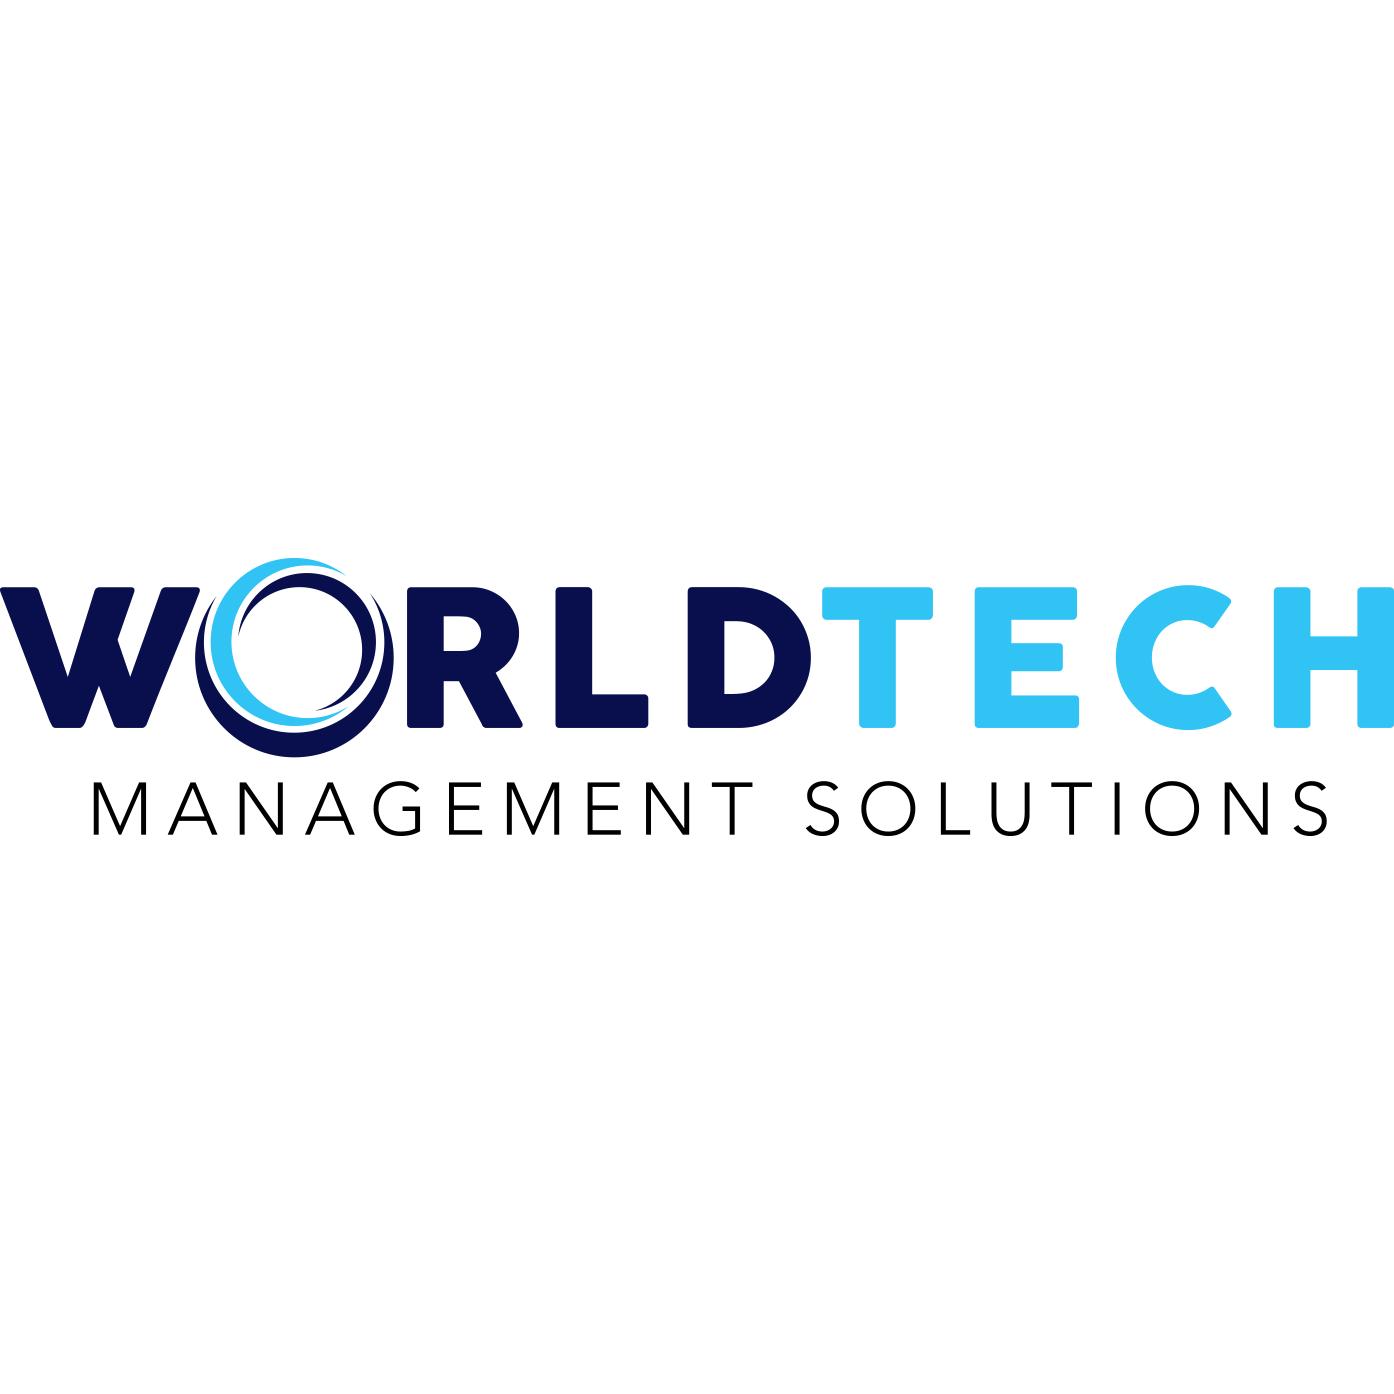 WorldTech Management Solutions image 10